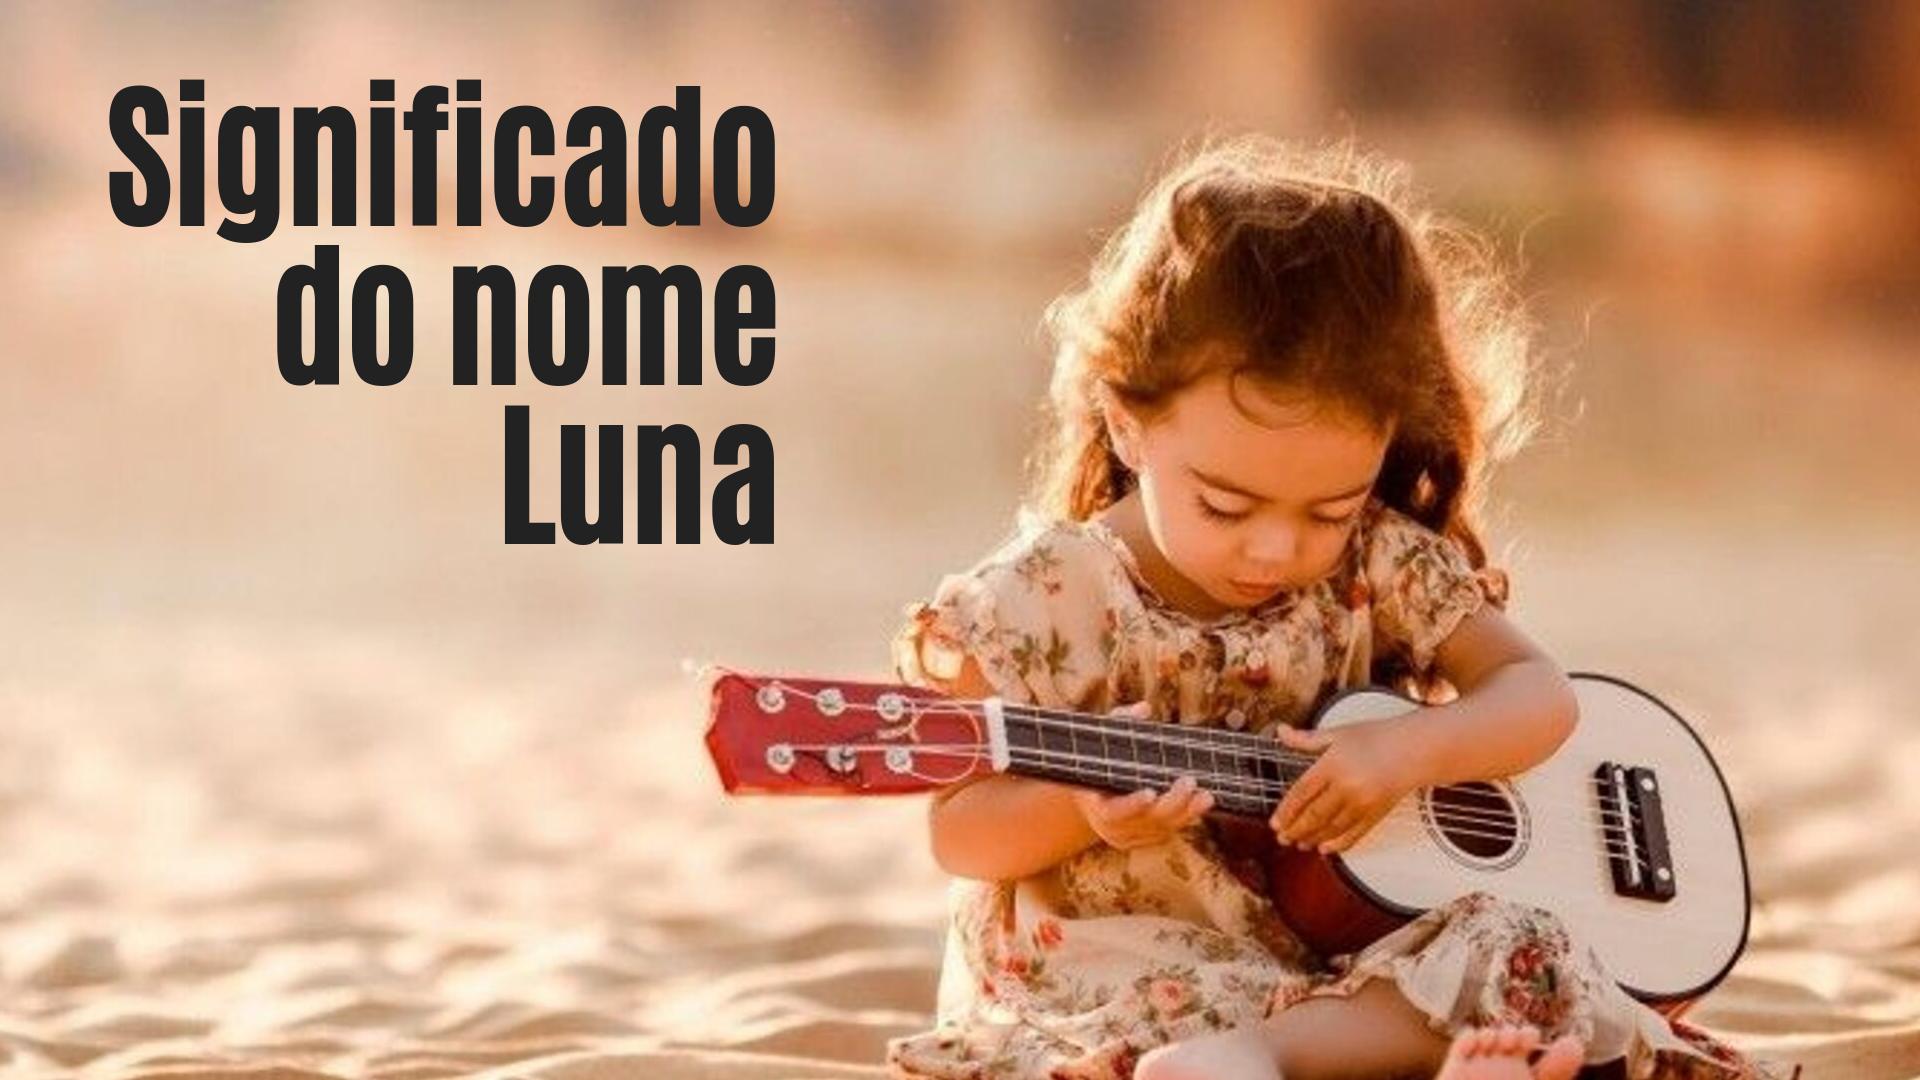 foto escrita significado do nome Luna